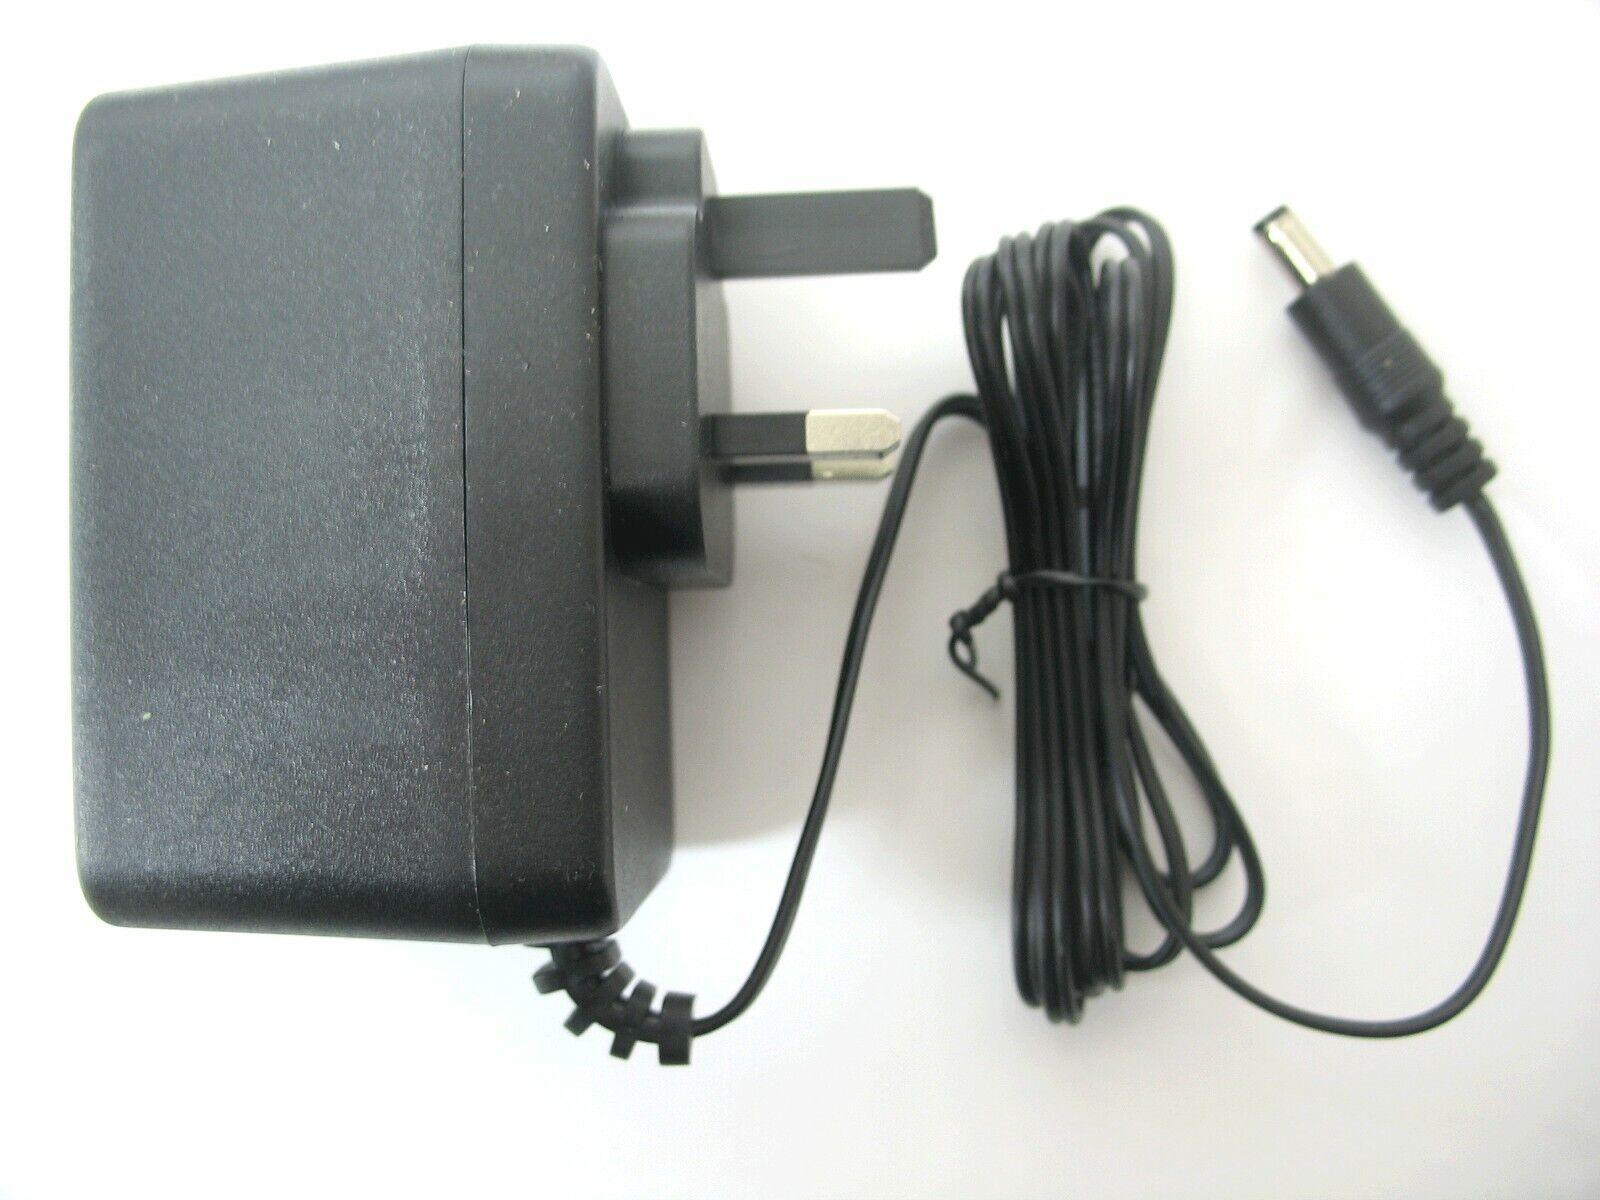 2 amp 15 volt AC-AC (AC Output) Mains Power Adaptor/Supply/Charger (30 watt)